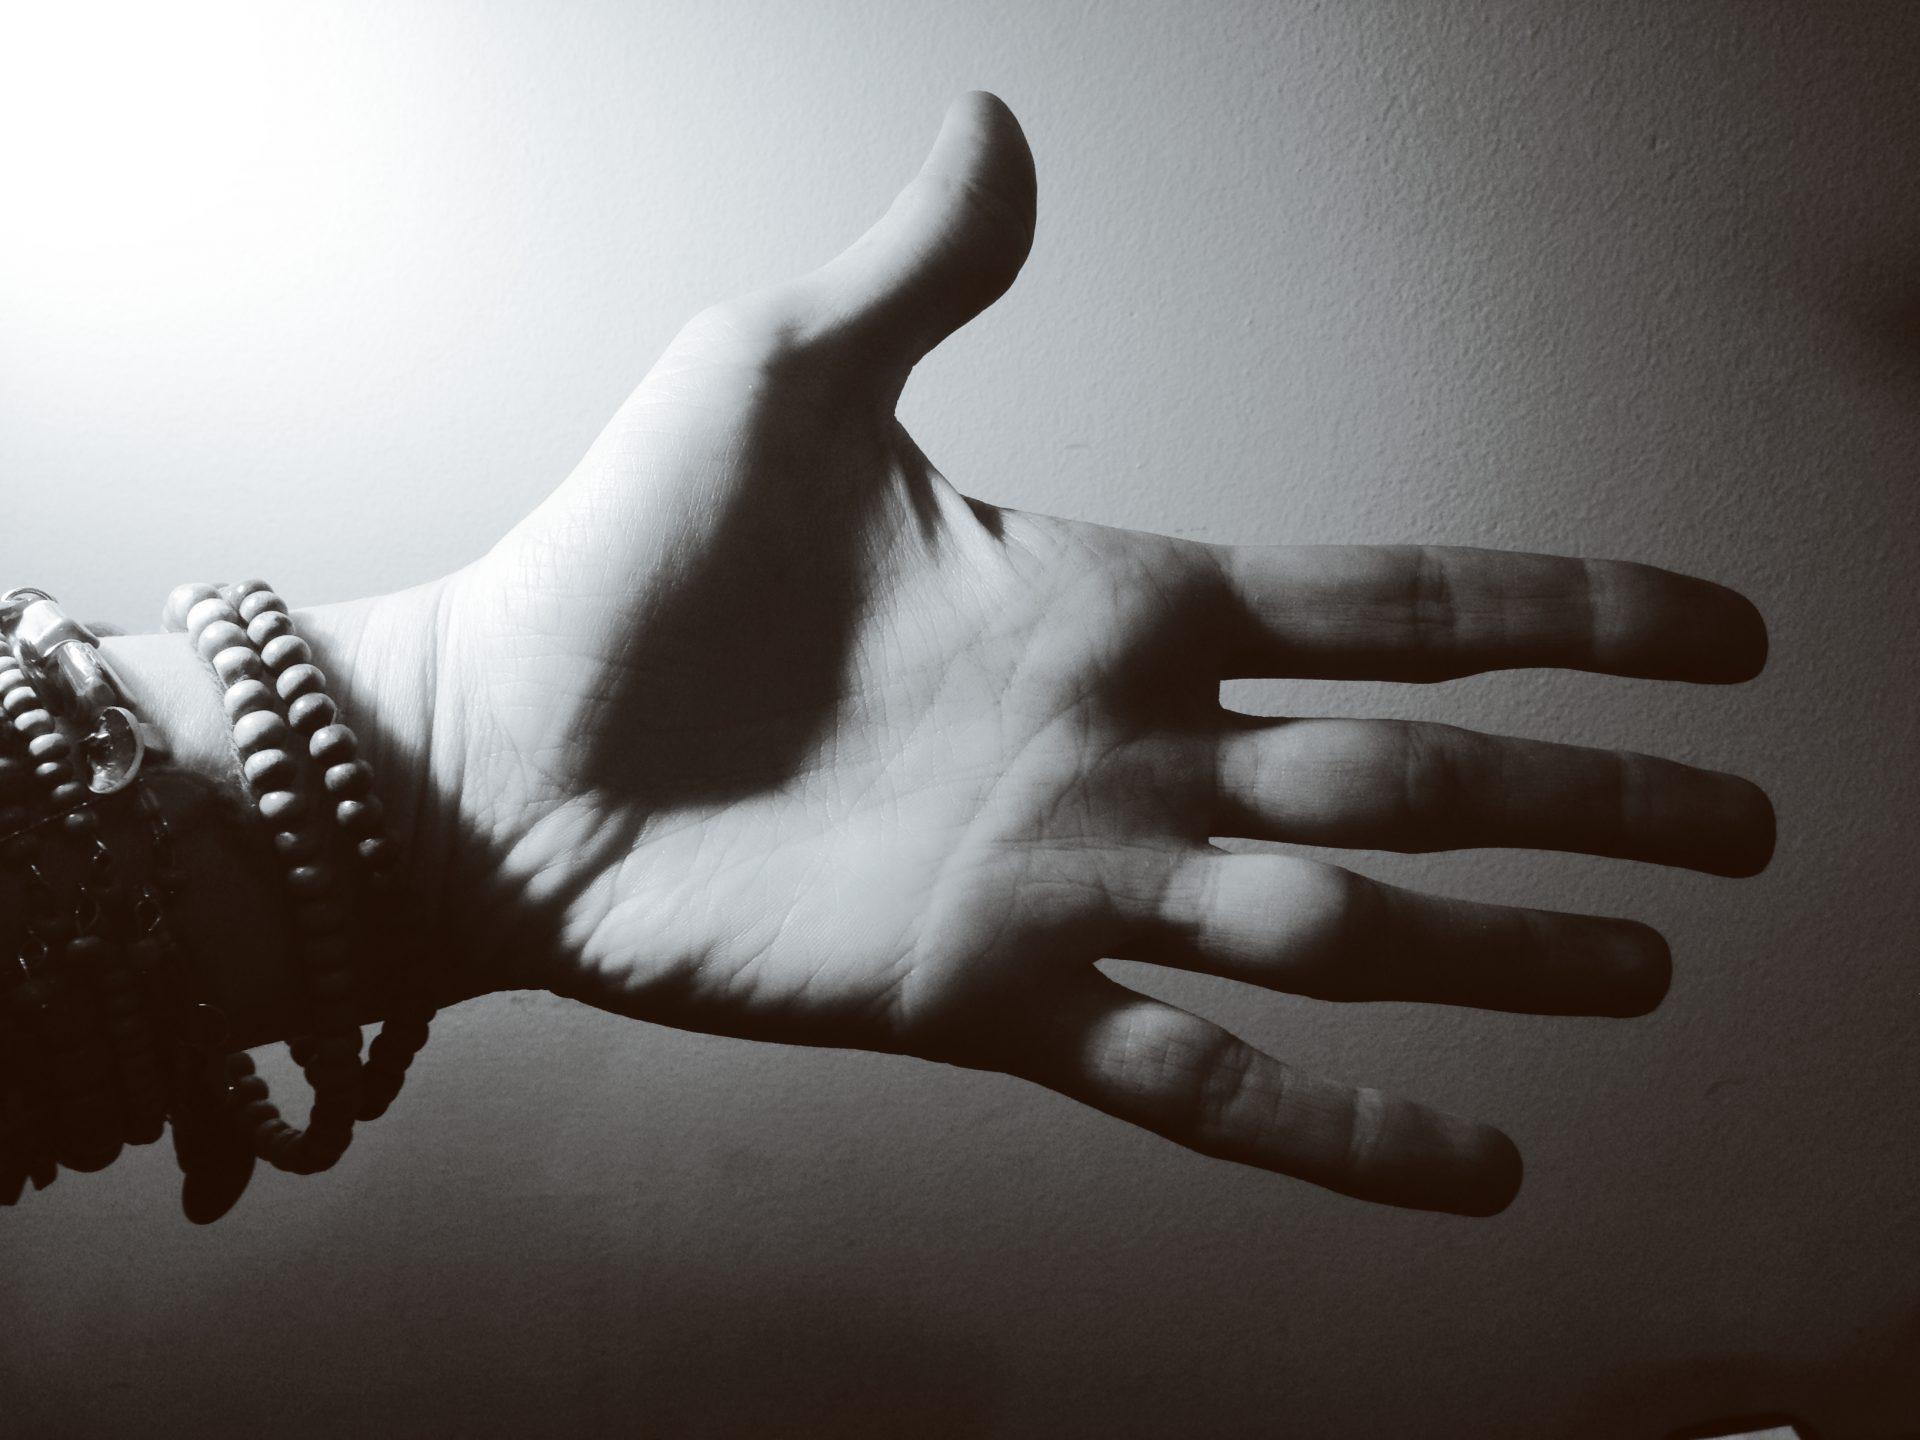 Openhanded, Openhearted - Monica Berg